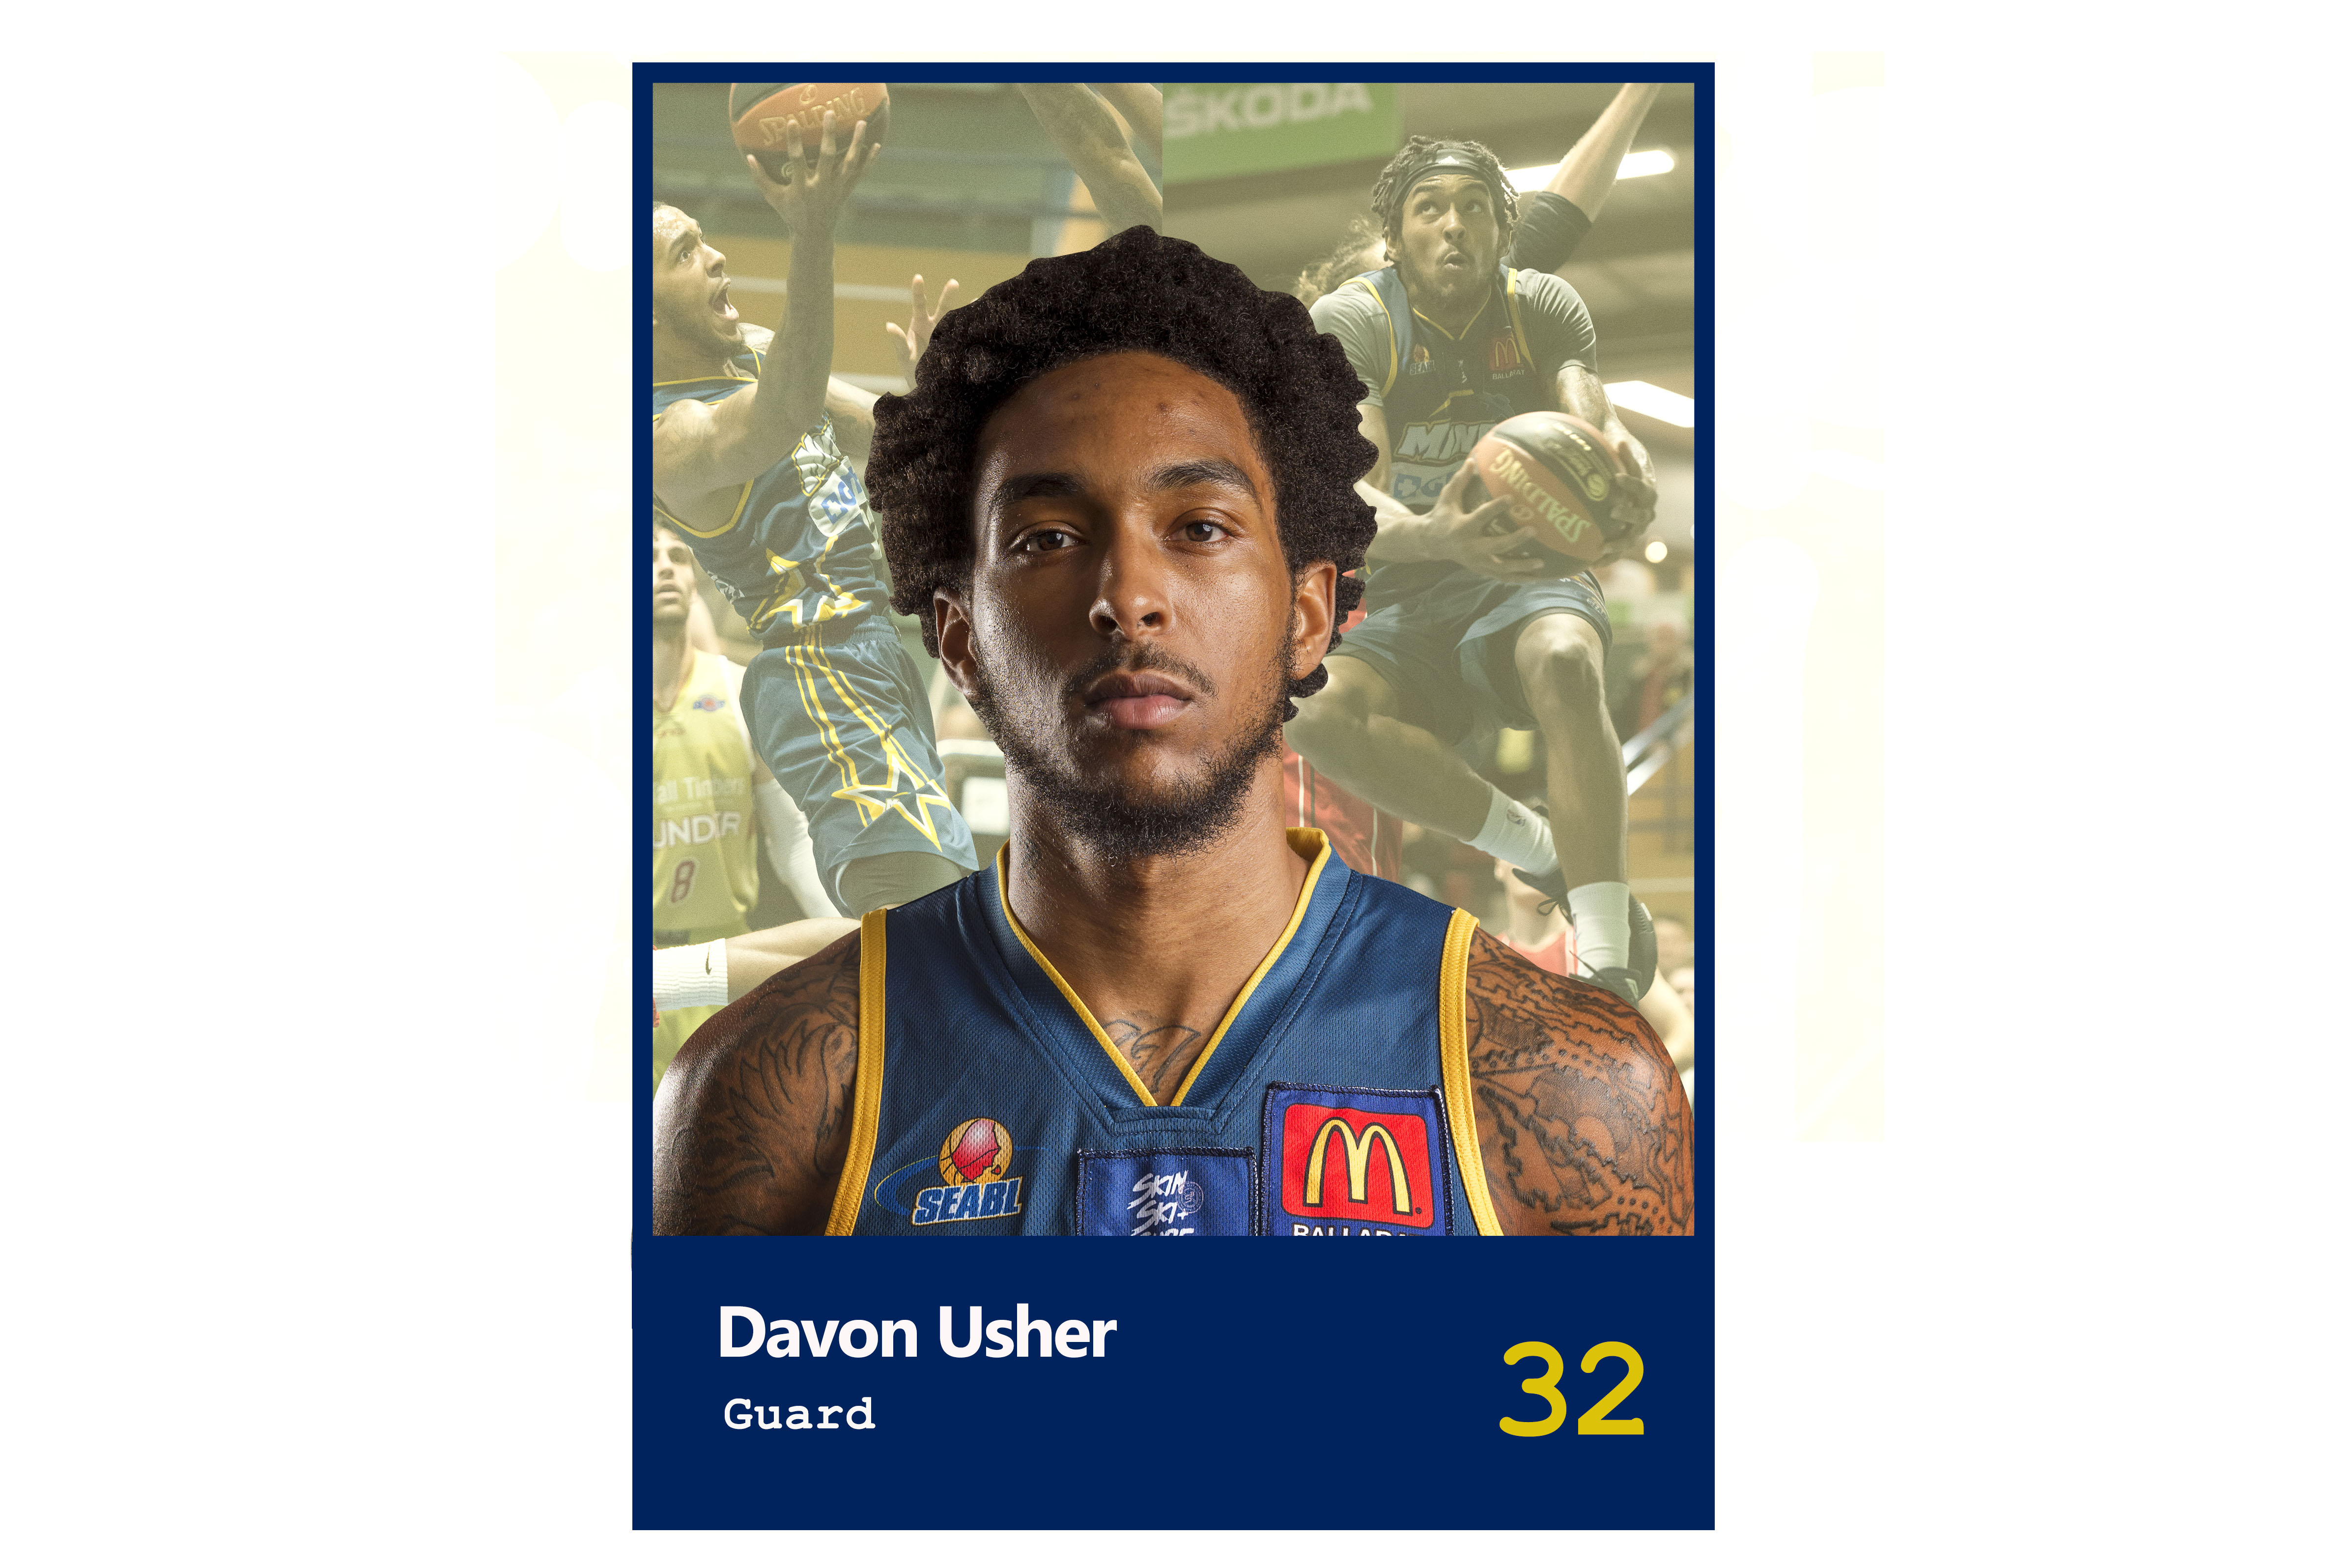 Davon Usher